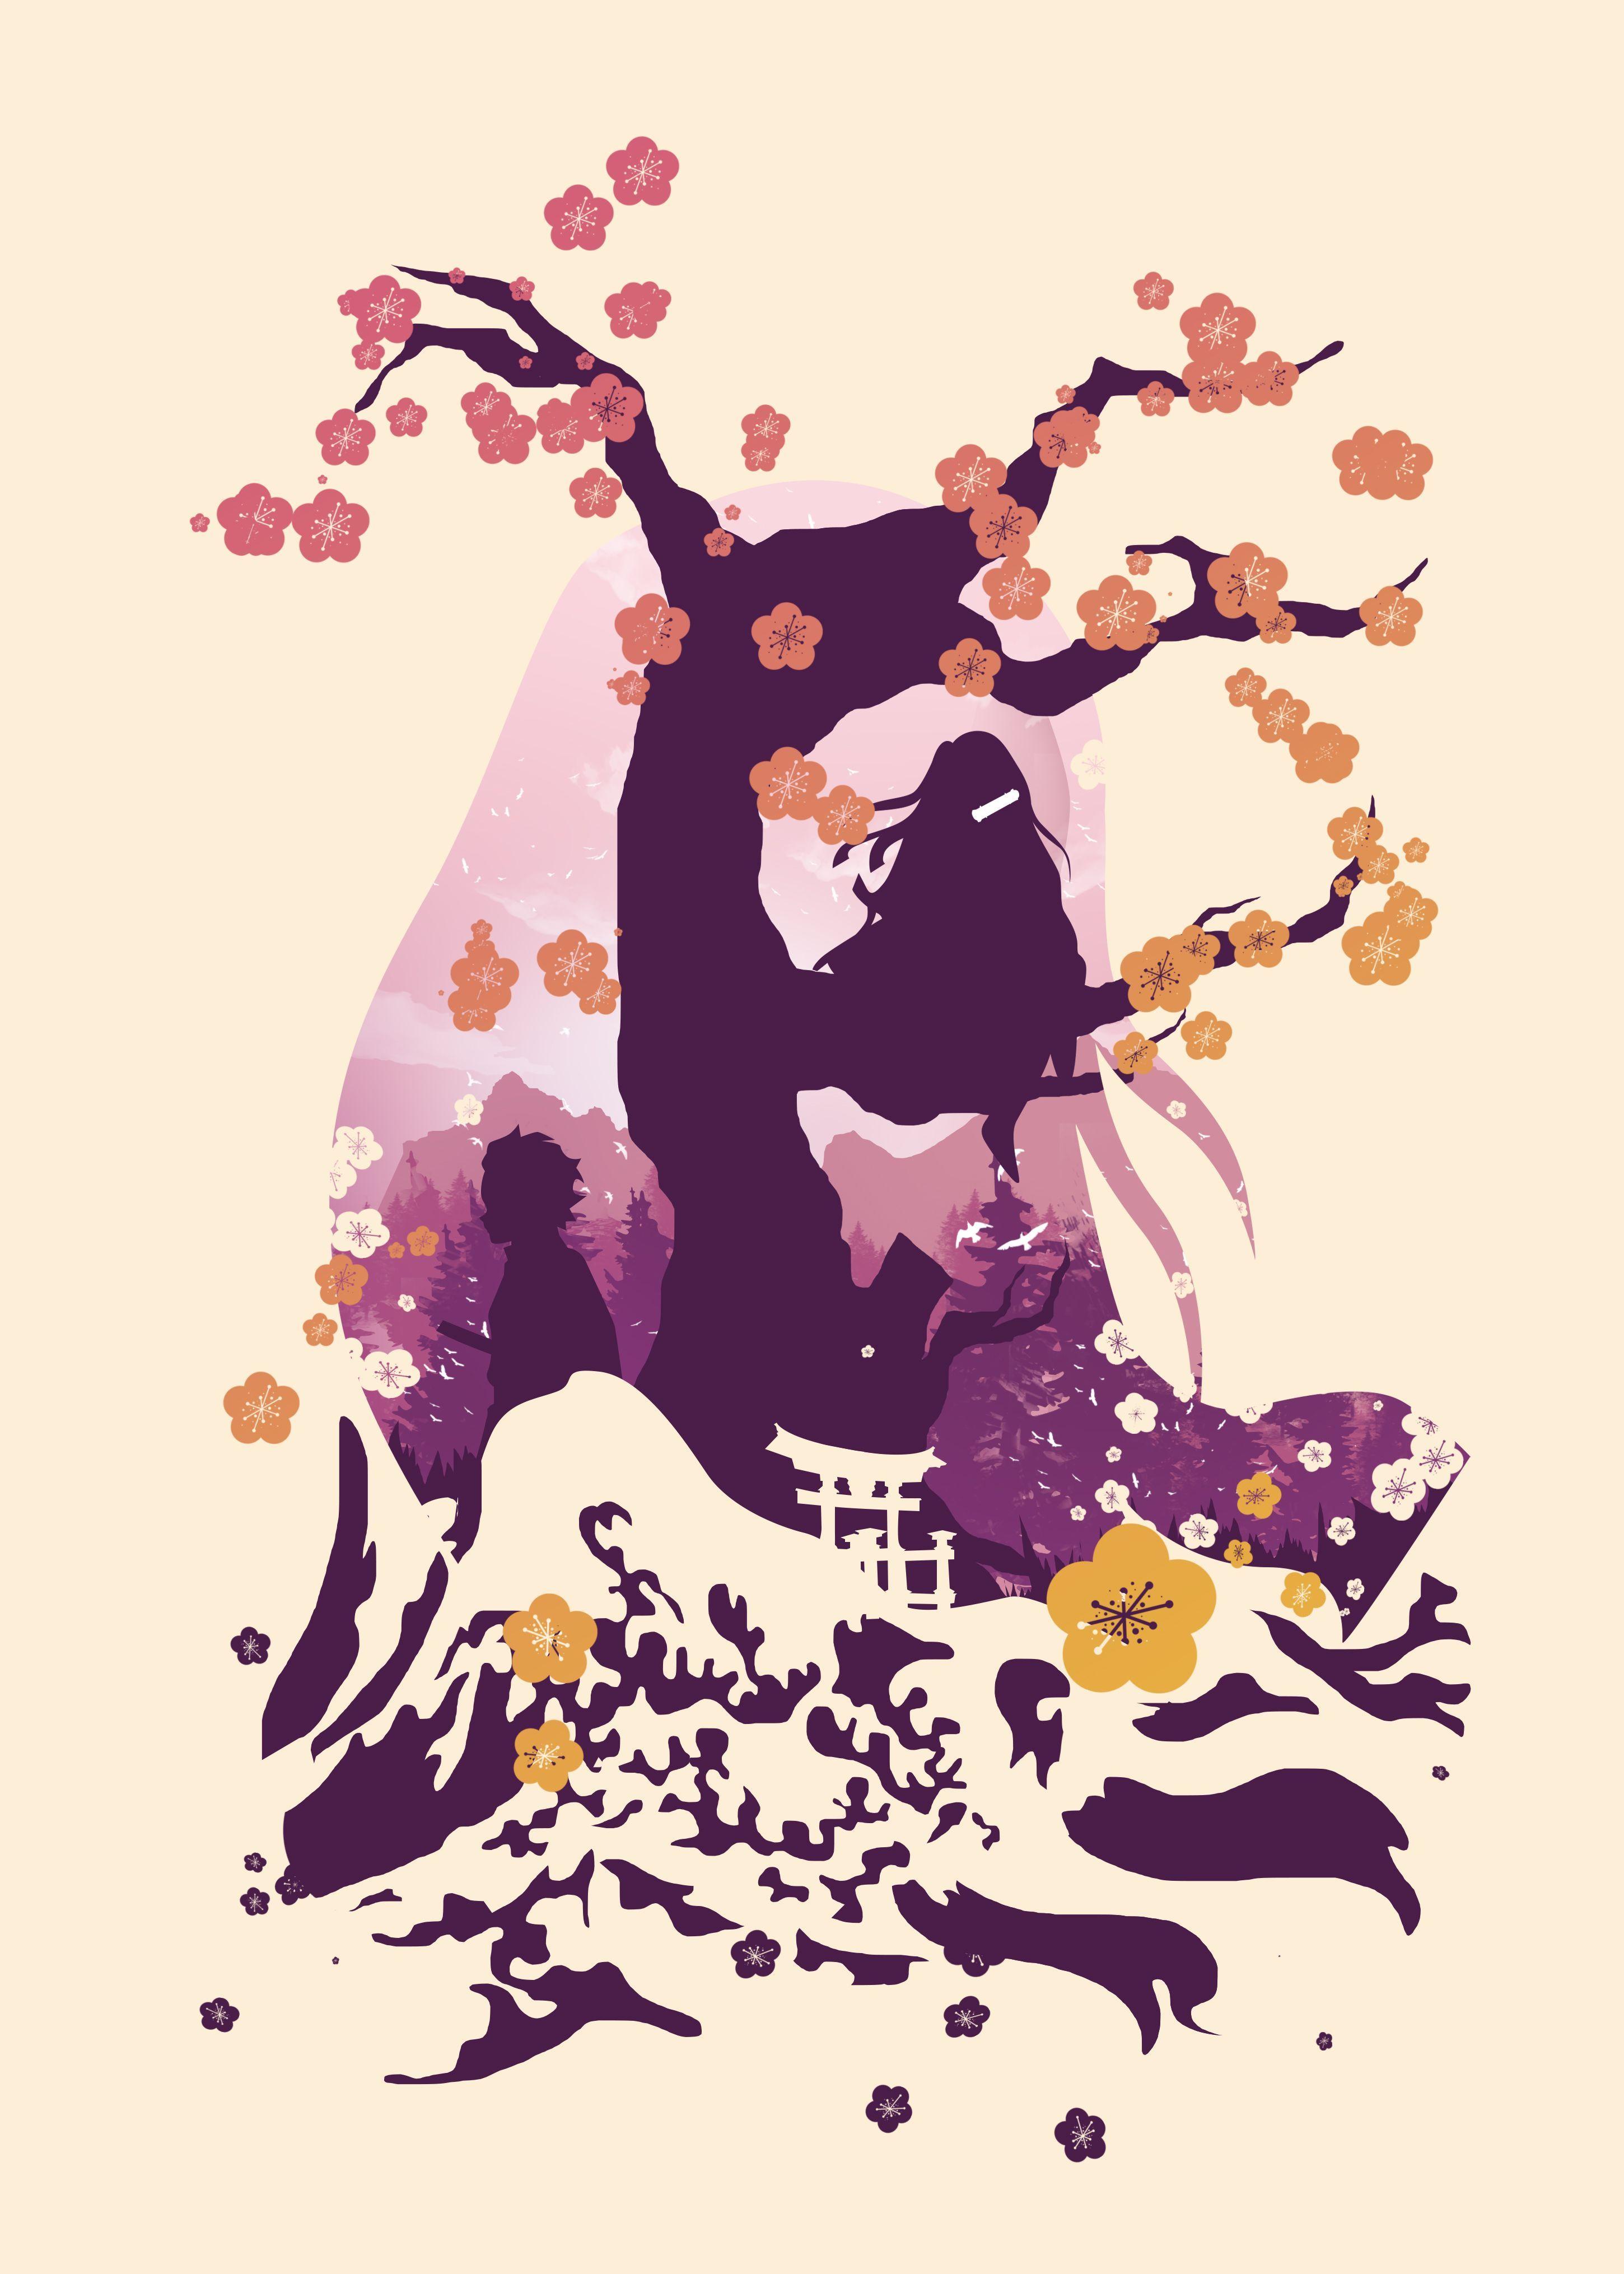 Nezukoデーモンスレイヤーアニメ・マンガのポスター印刷|メタルポスター | Displate thumbnail